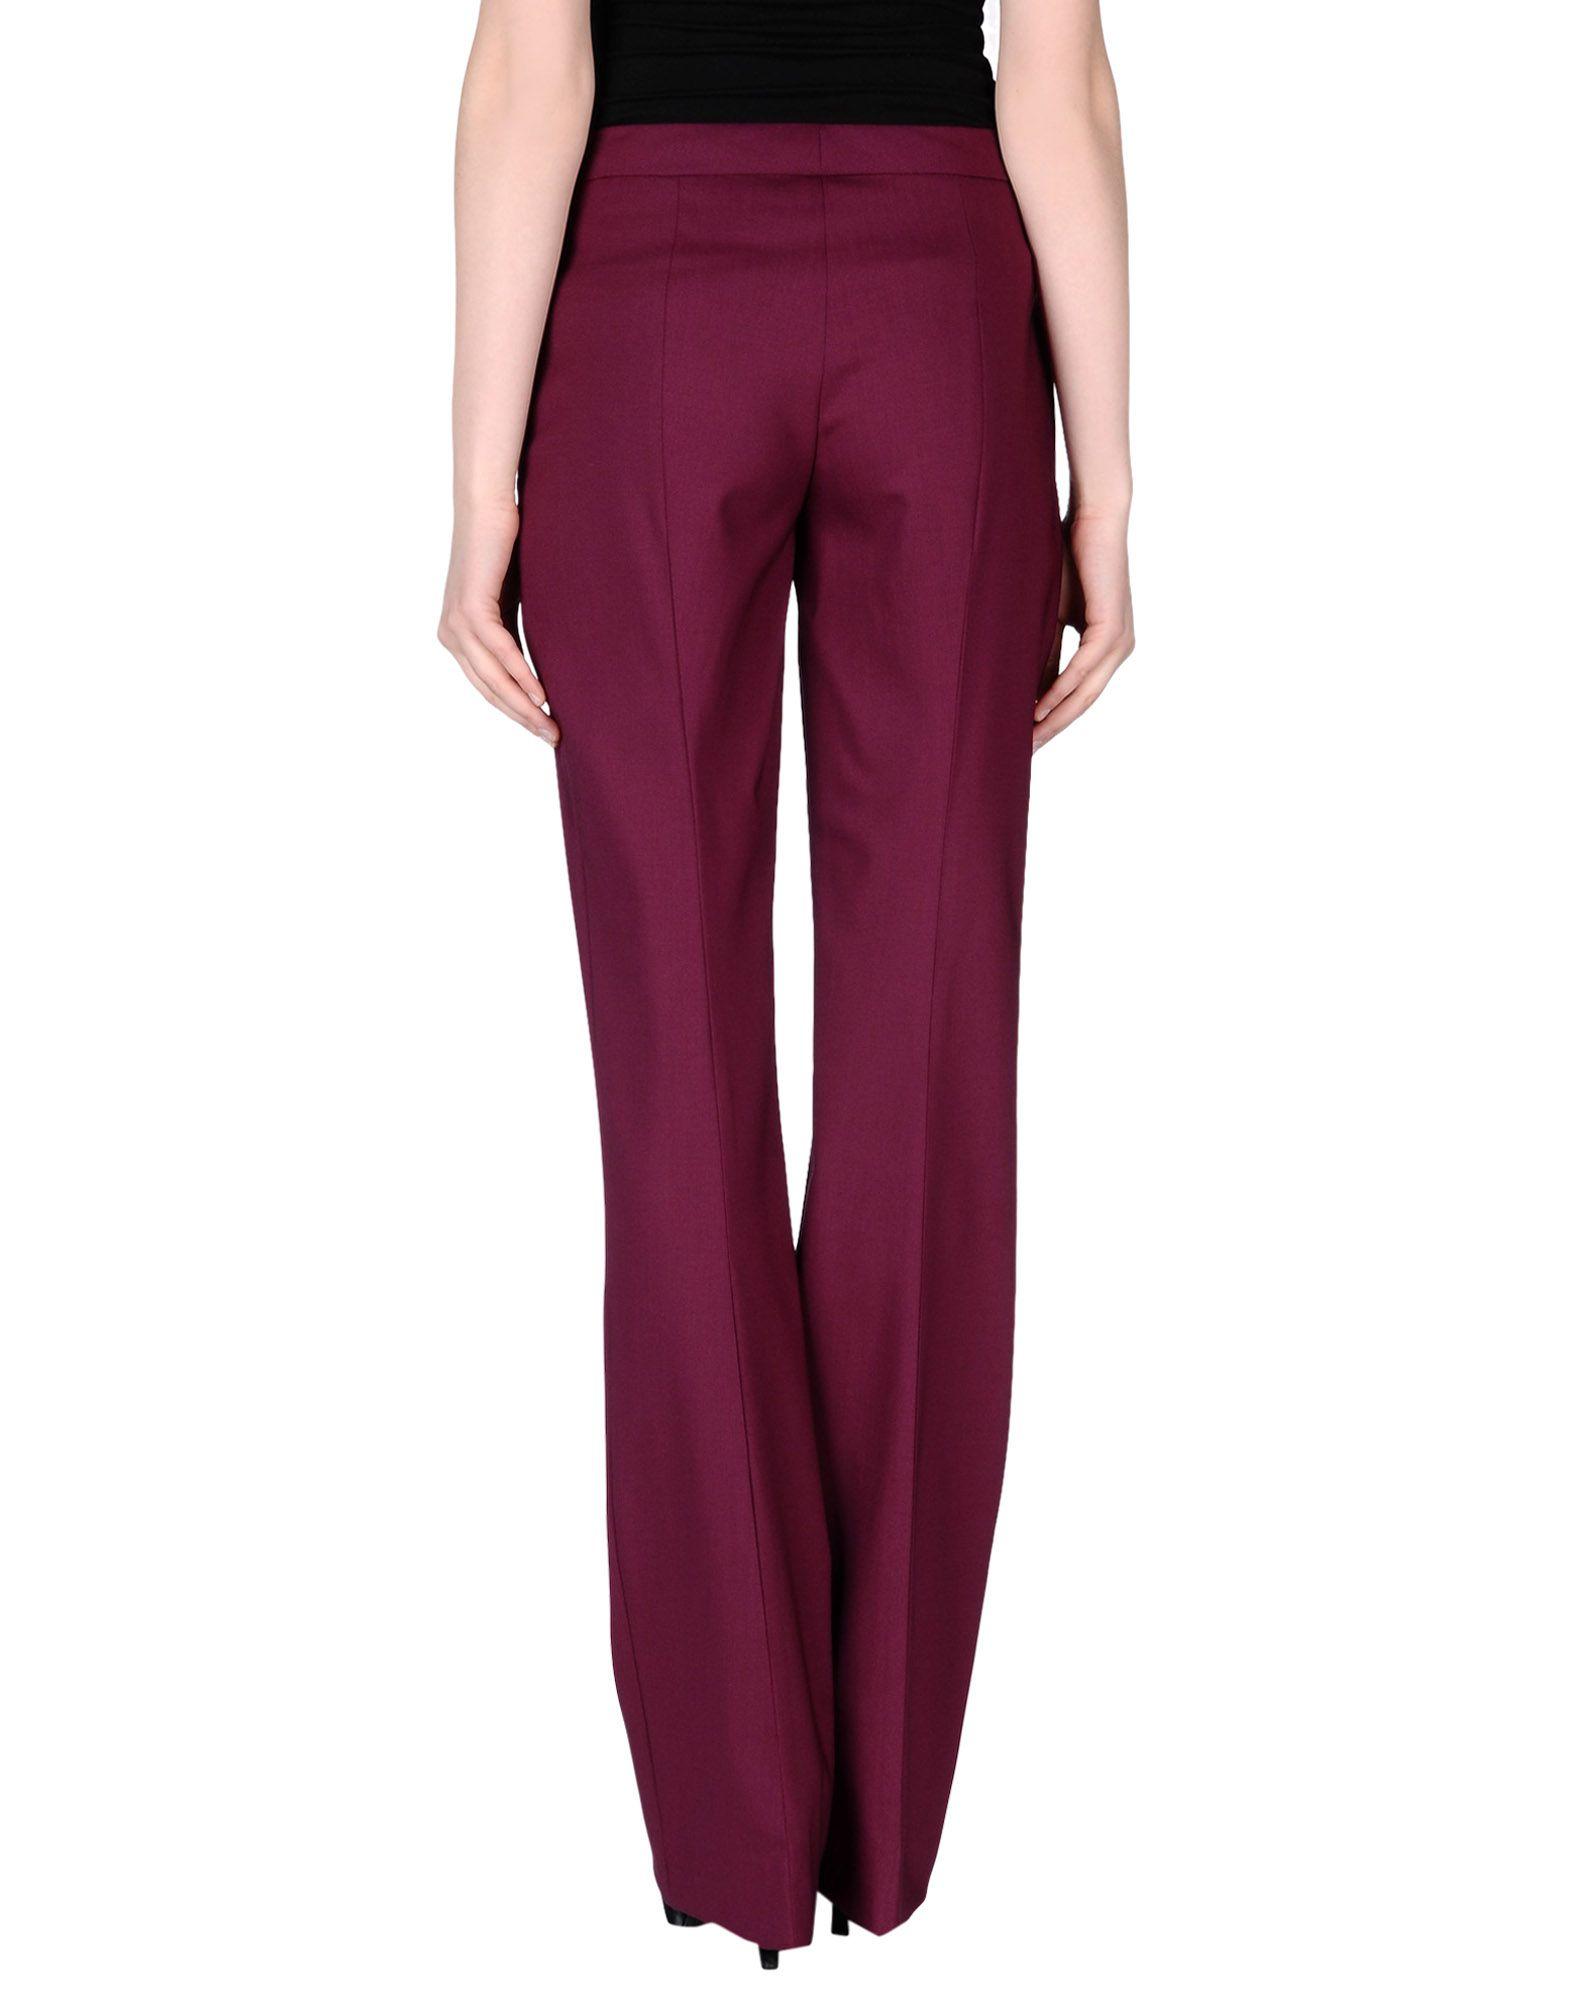 Prada Casual Trouser in Purple (Garnet) | Lyst